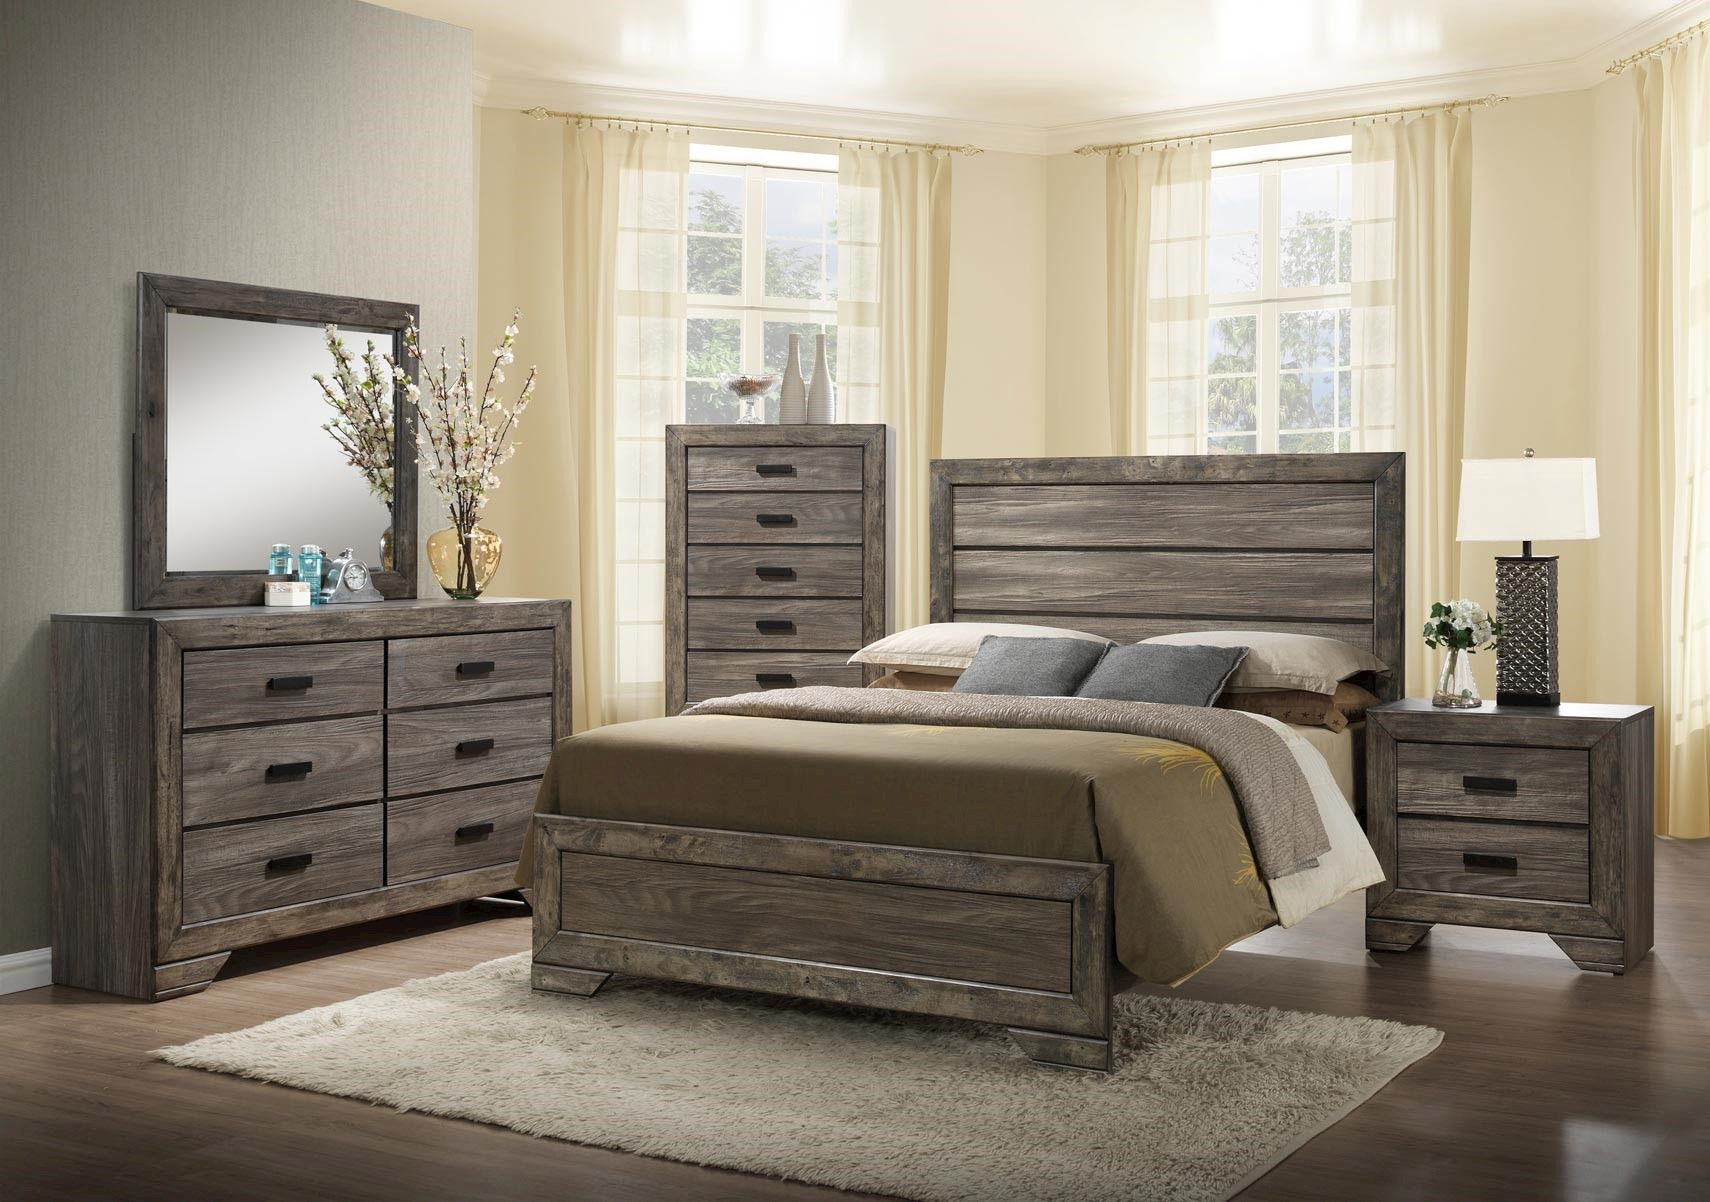 Lacks | Nathan 4 Pc Queen Bedroom Set